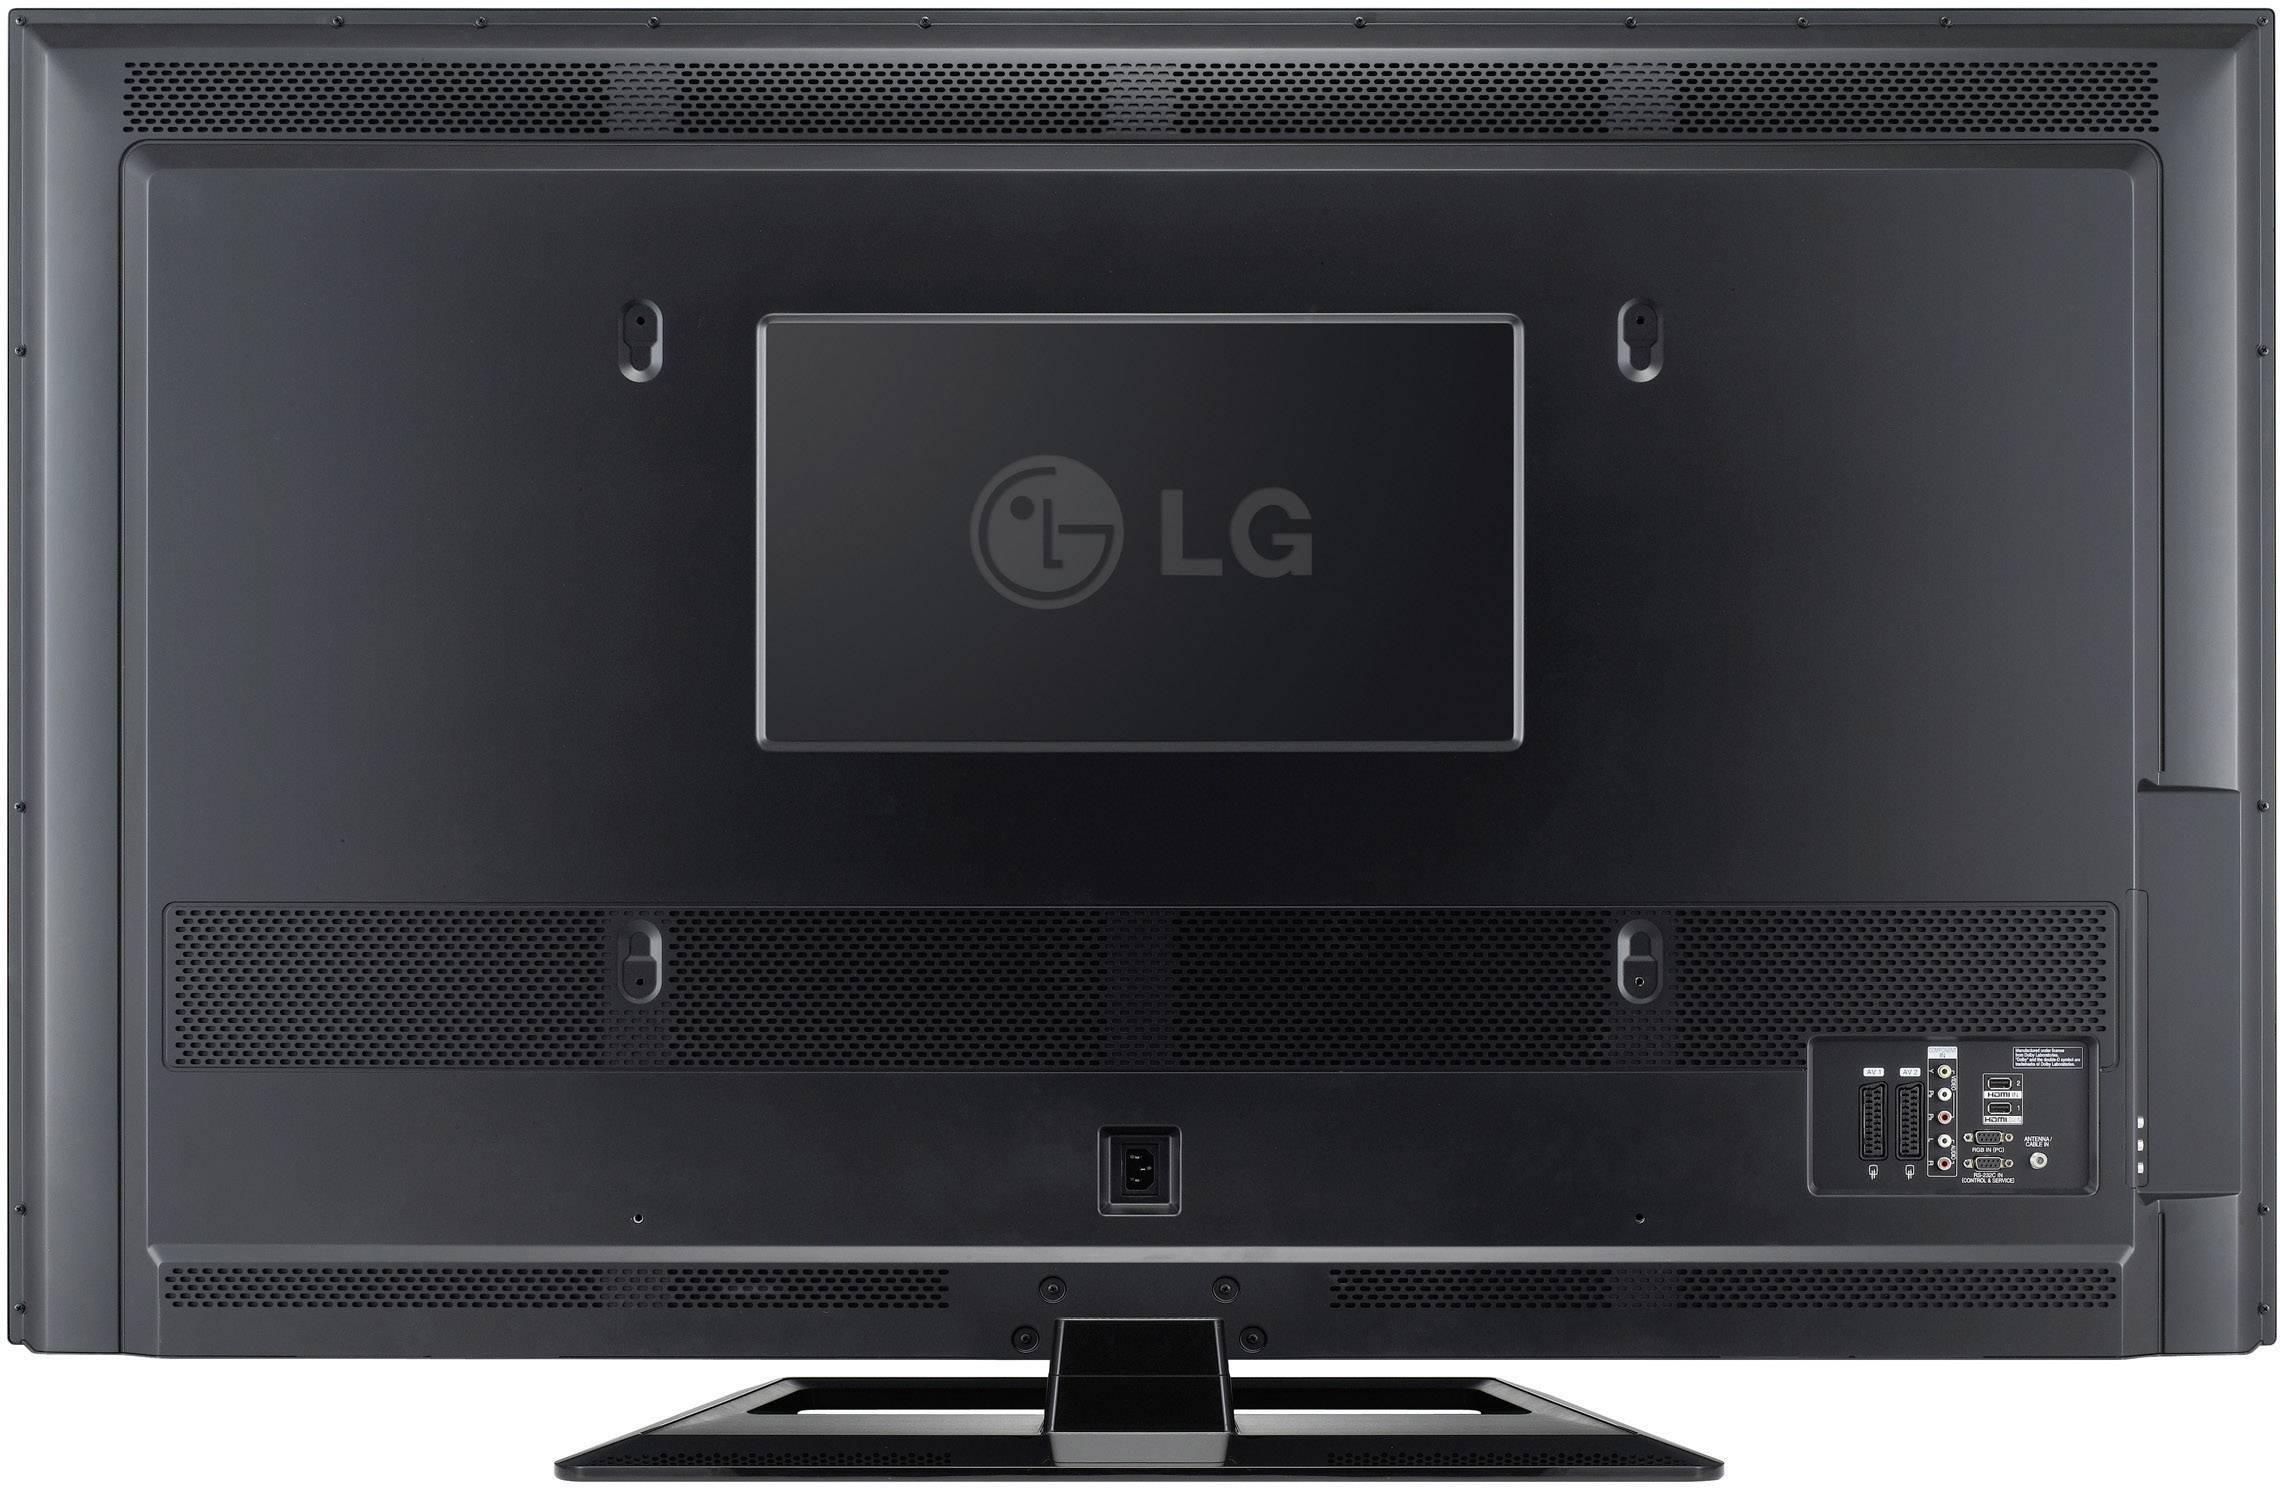 Lg Electronics 60pa6500 155 Cm 60 Plasma Tv